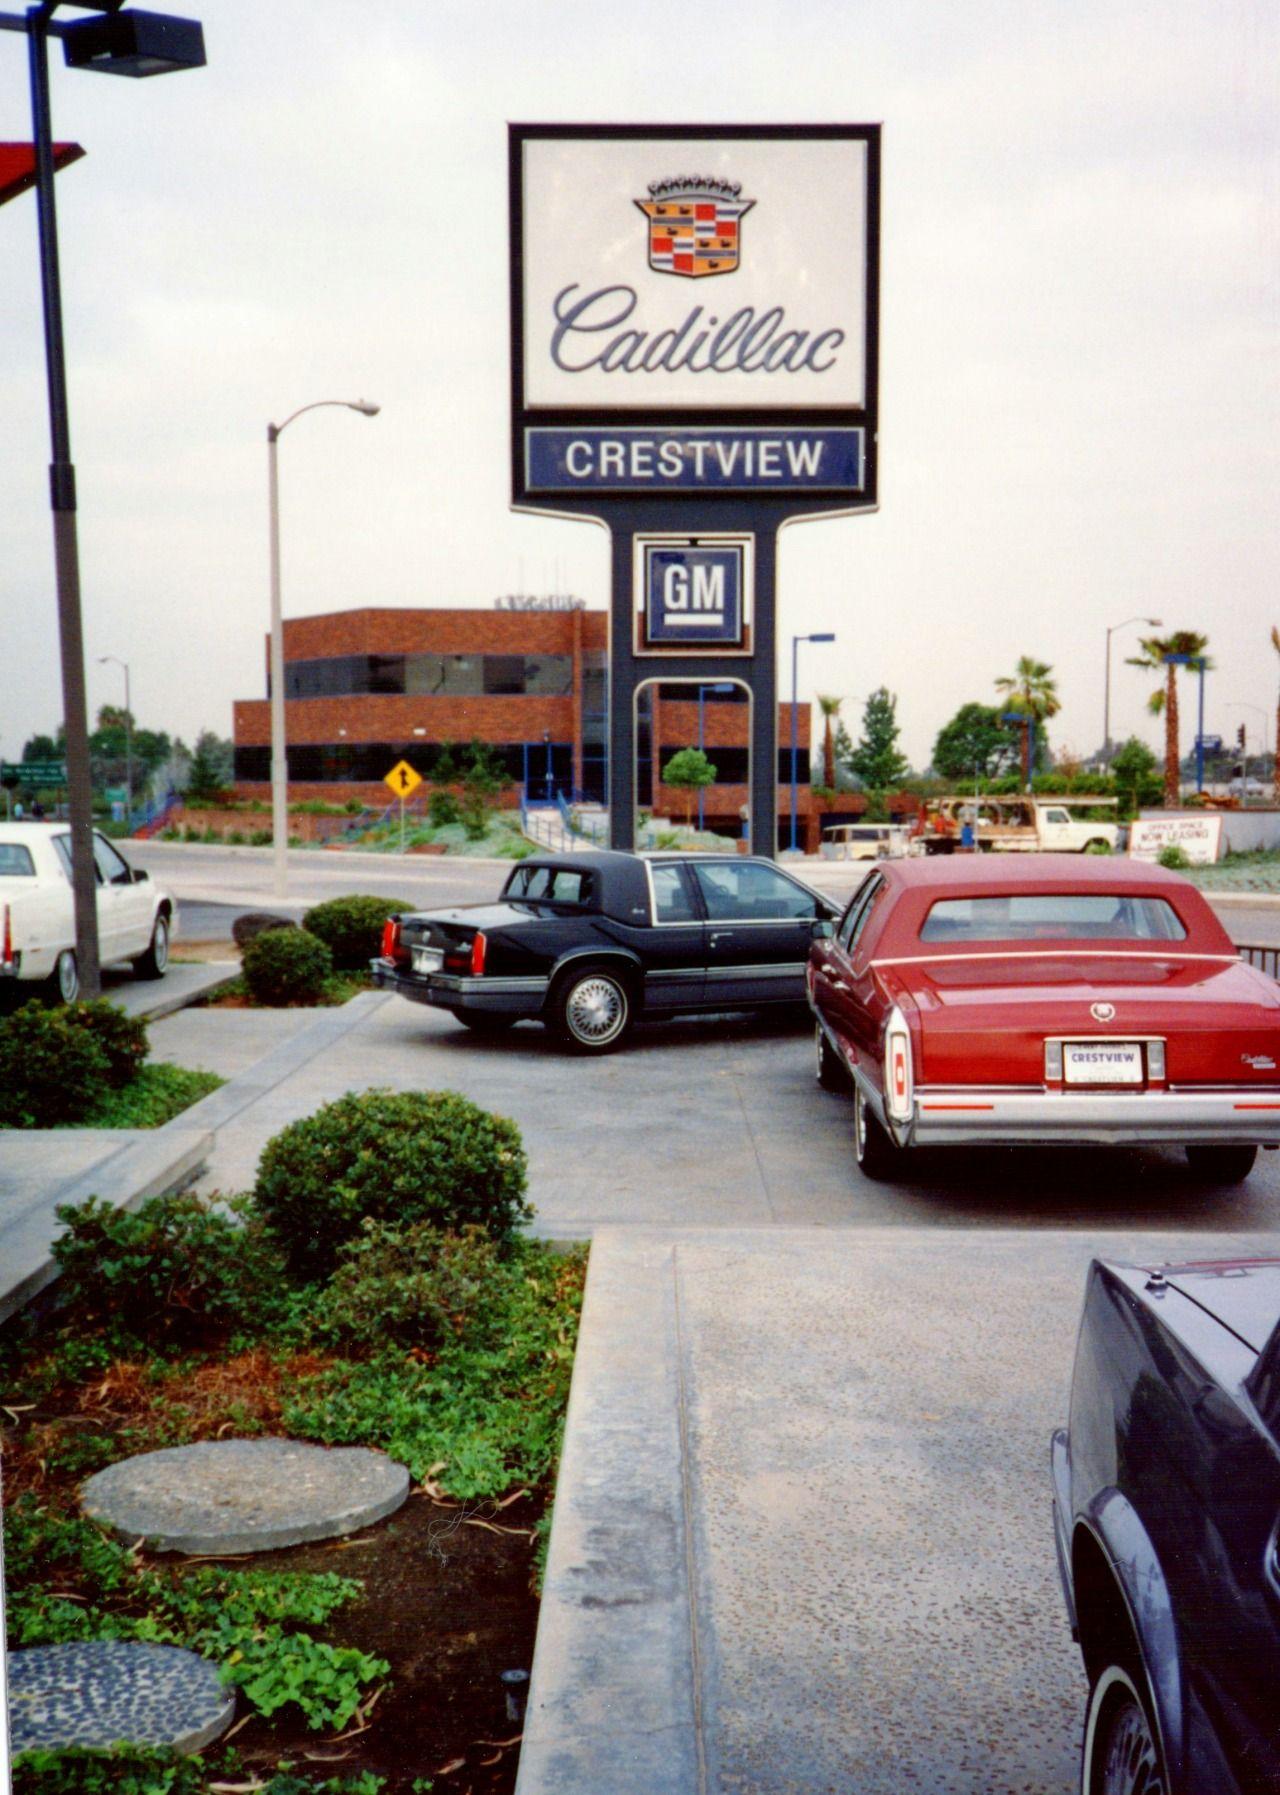 Pin on buick / Cadillac/Oldsmobile/ showroom